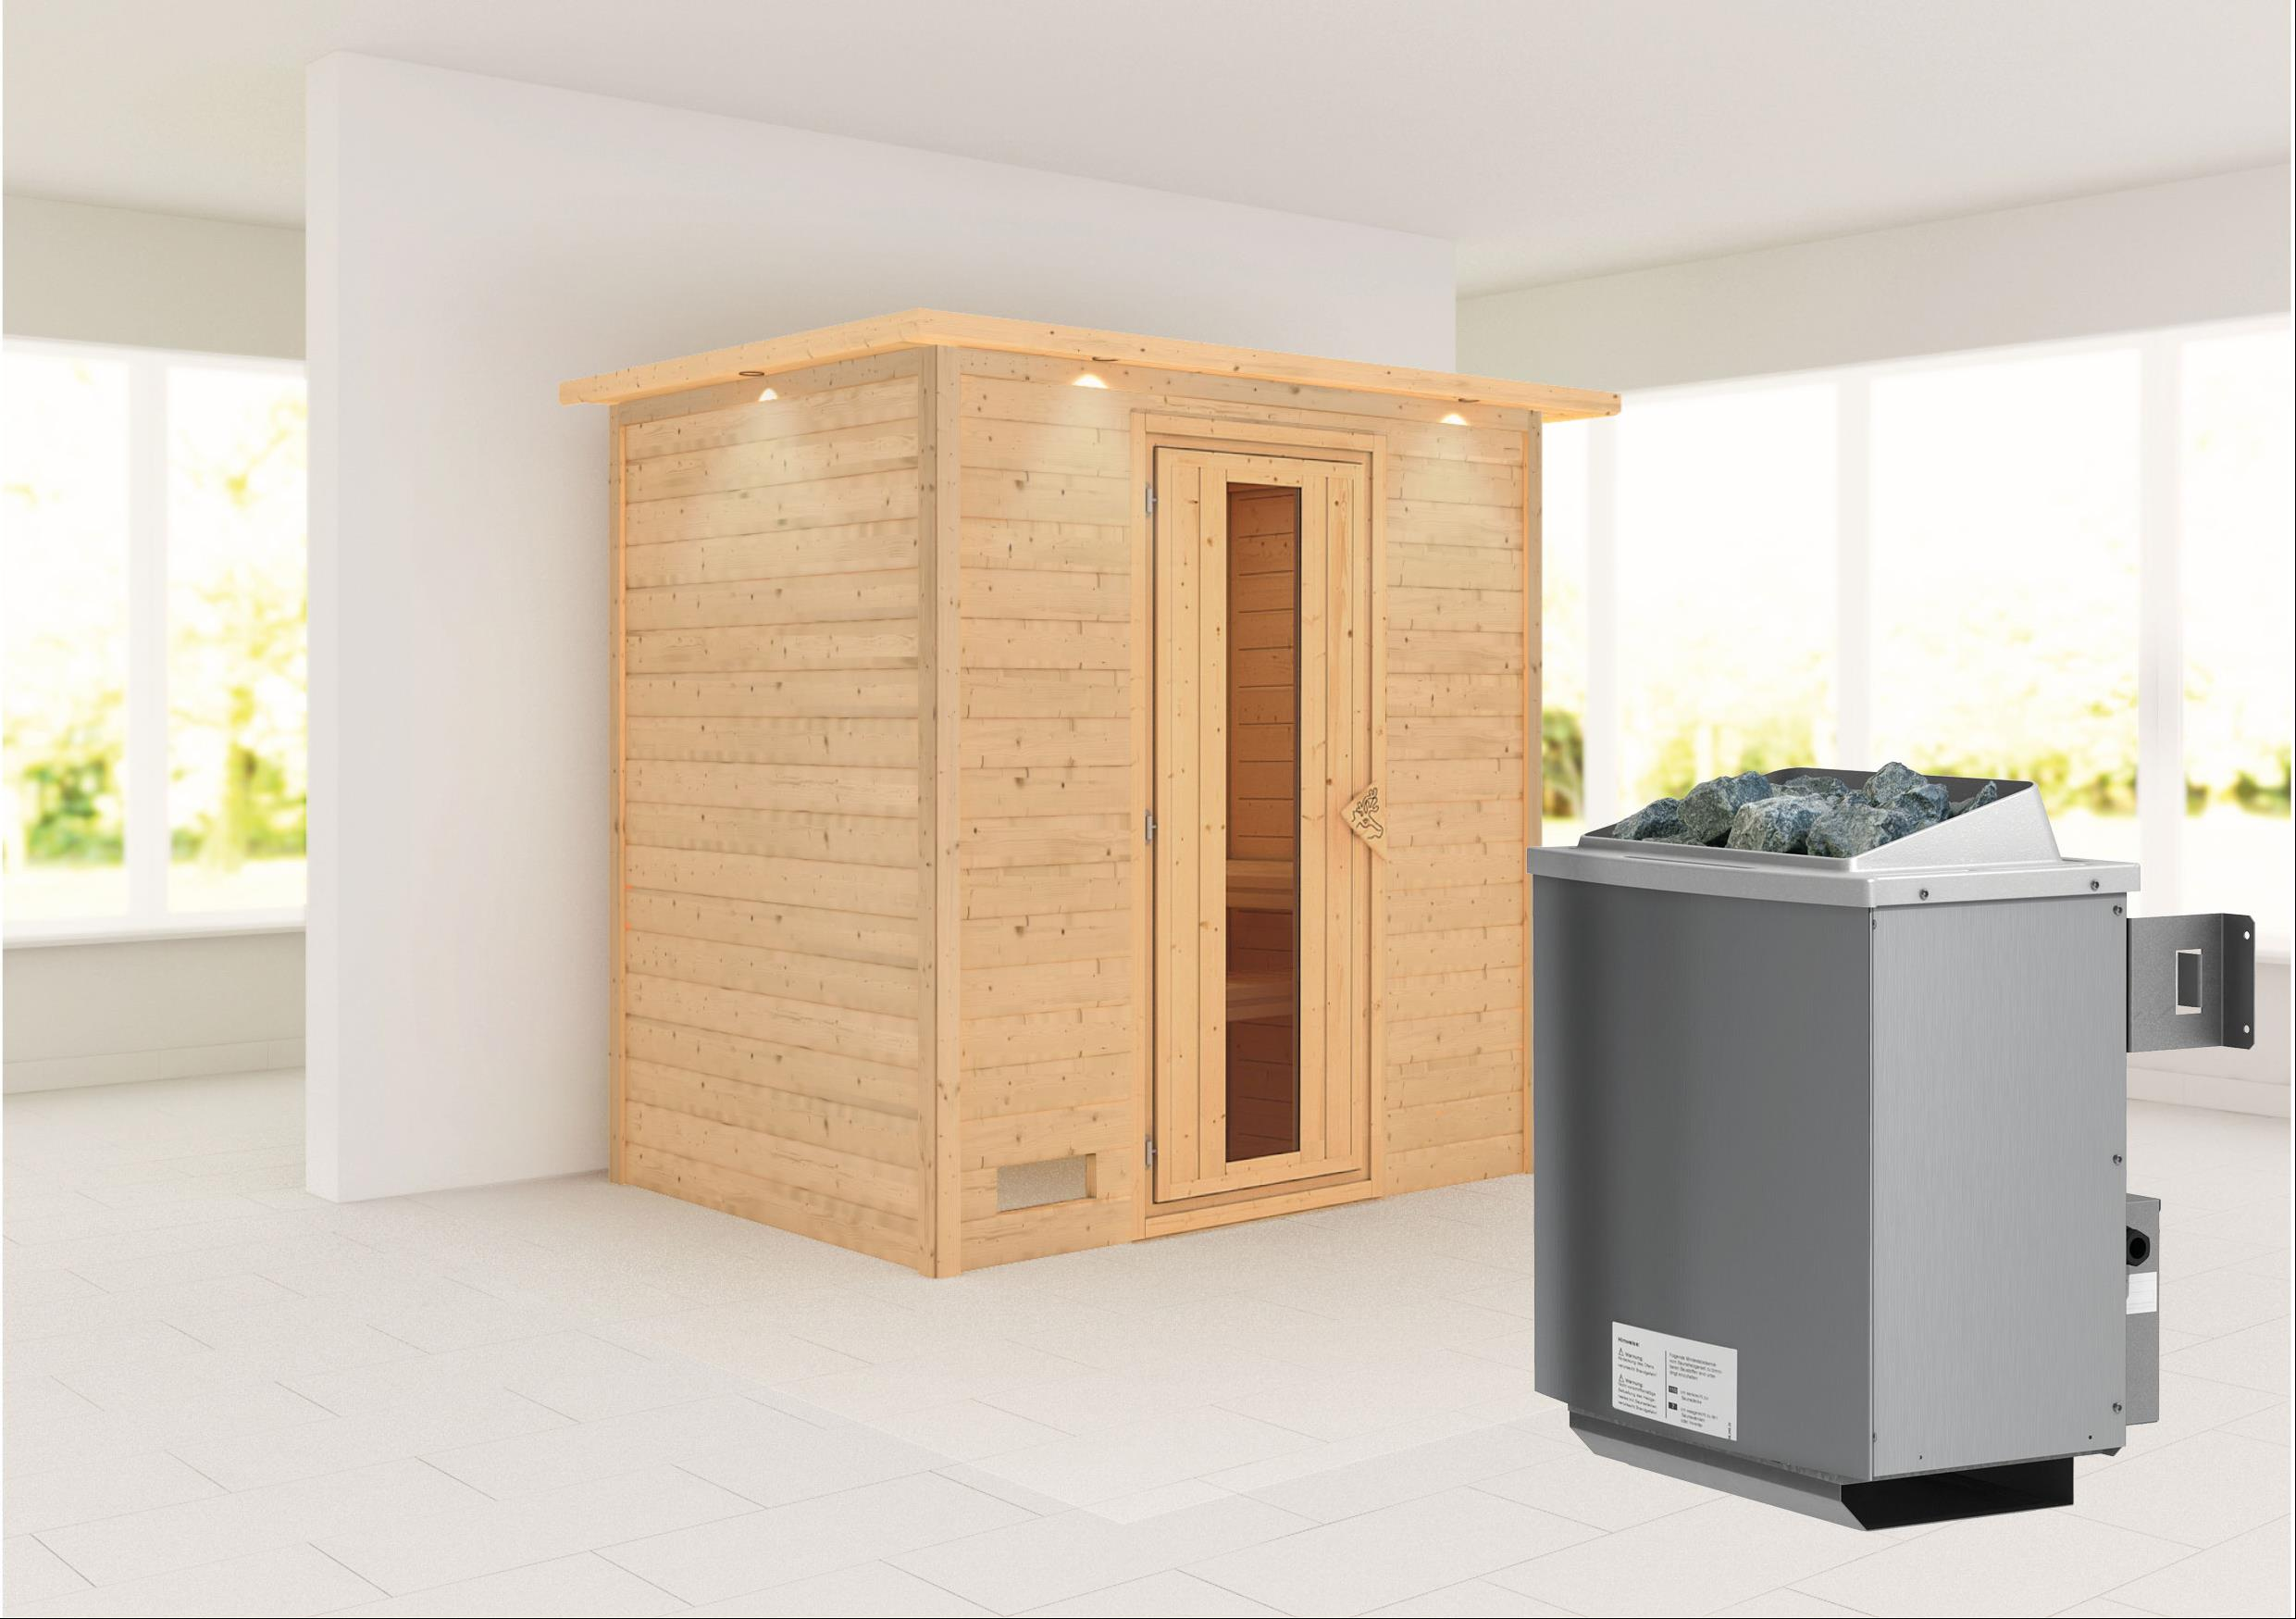 WoodFeeling Sauna Sonja 38mm Saunaofen 9 kW intern Dachkranz Holztür Bild 1